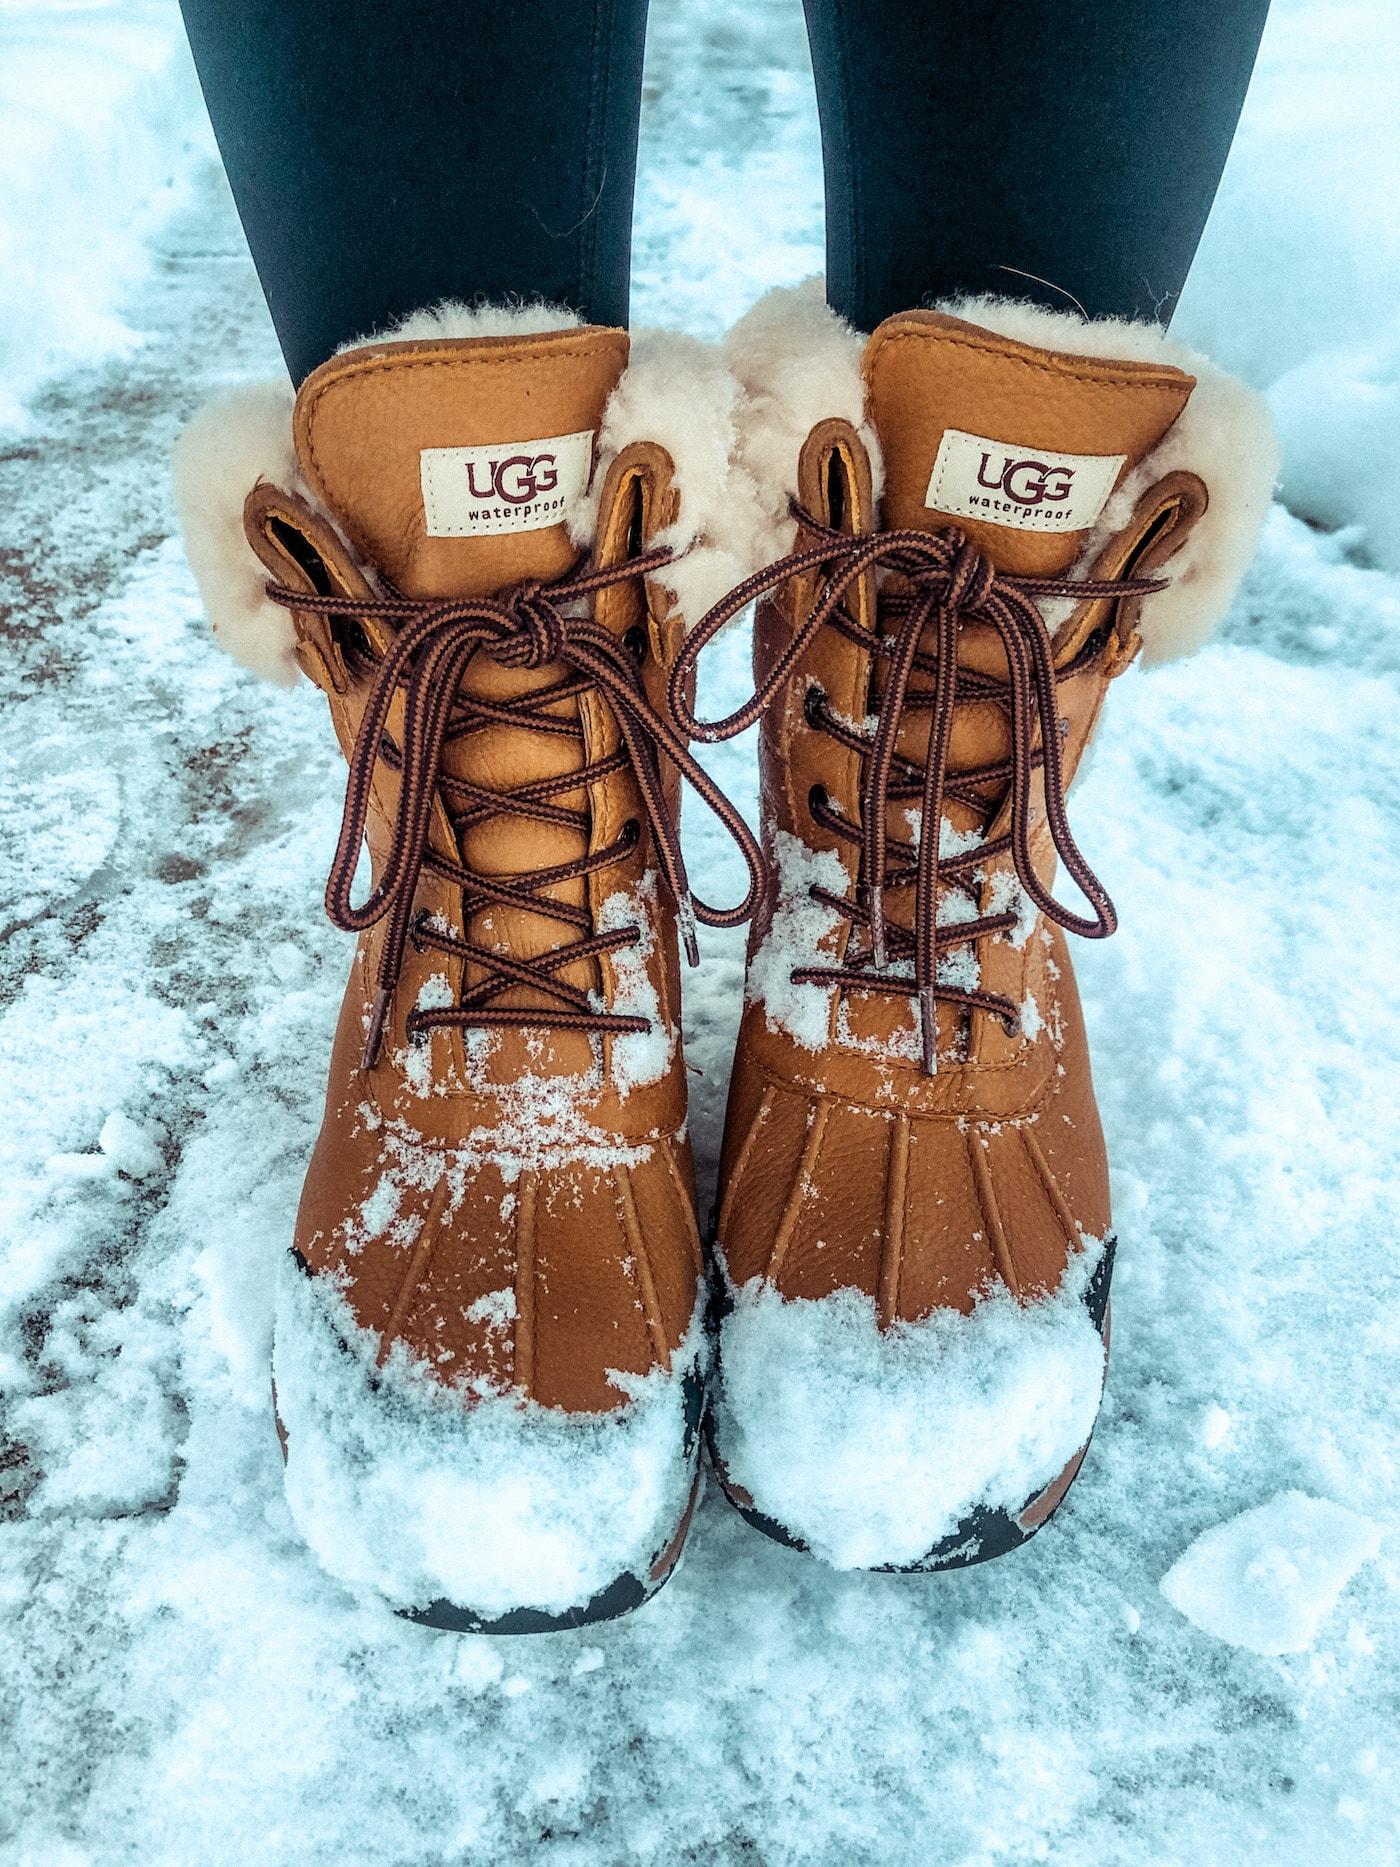 Snow Boots for Colorado